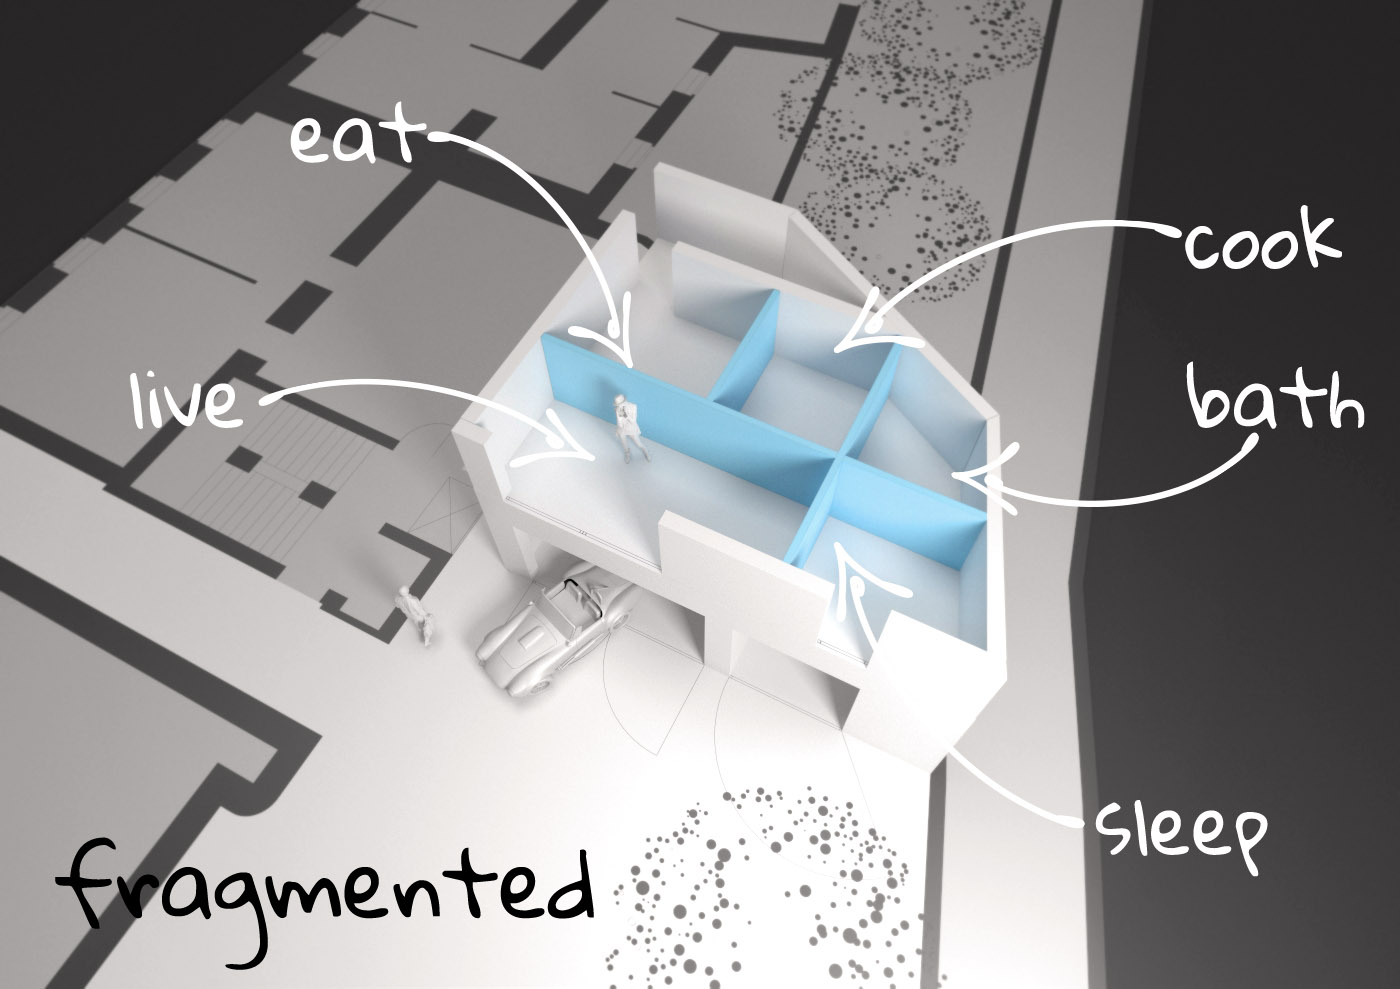 Fragmented Diagram